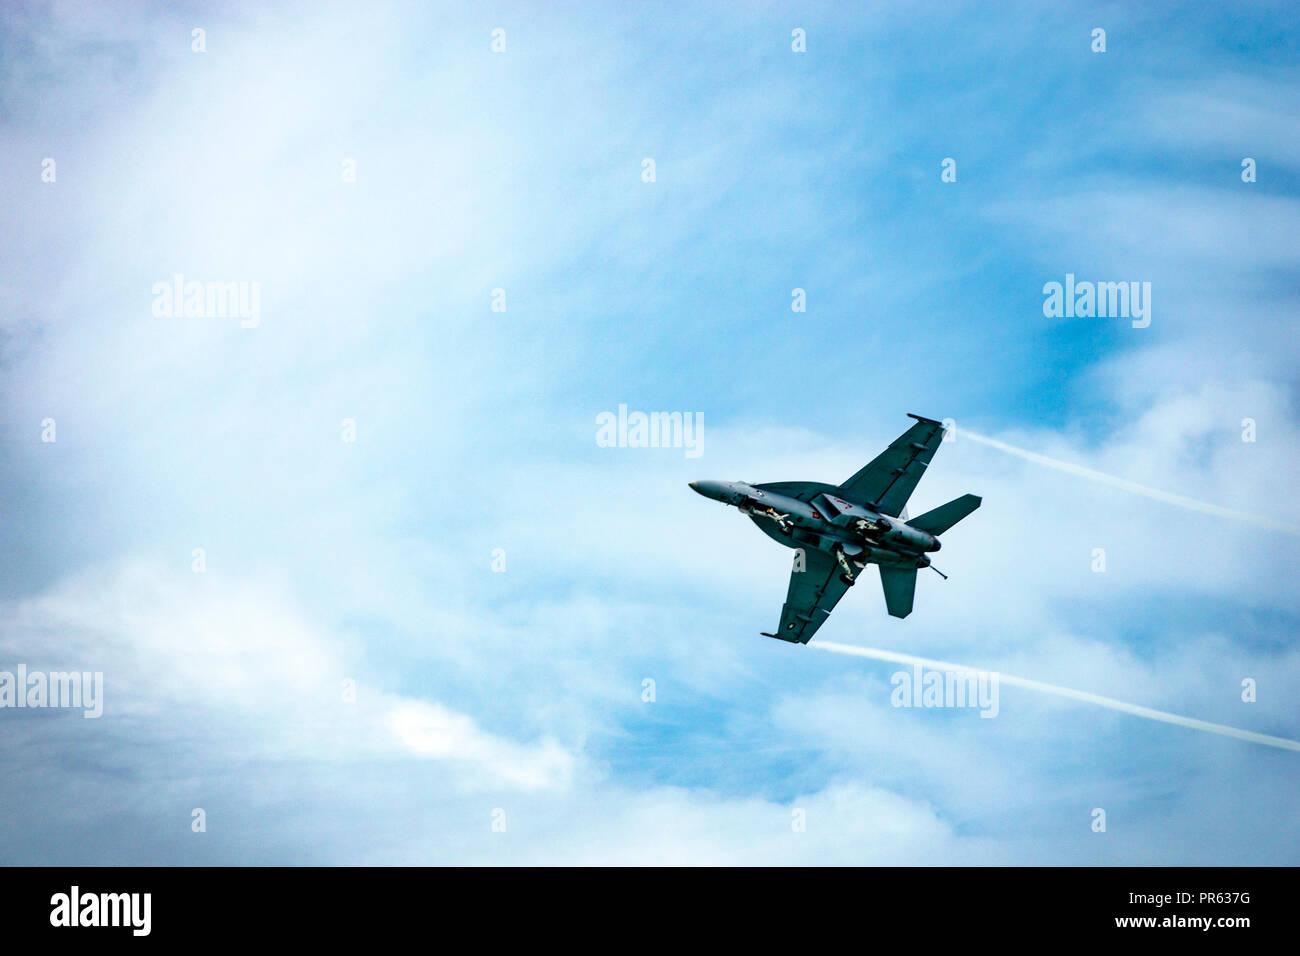 Miami Beach Florida Nacional saludamos a America's Heroes Air & Sea Show McDonnell Douglas F/A-18 Hornet bimotor supersonic all-weather capa portadora Foto de stock